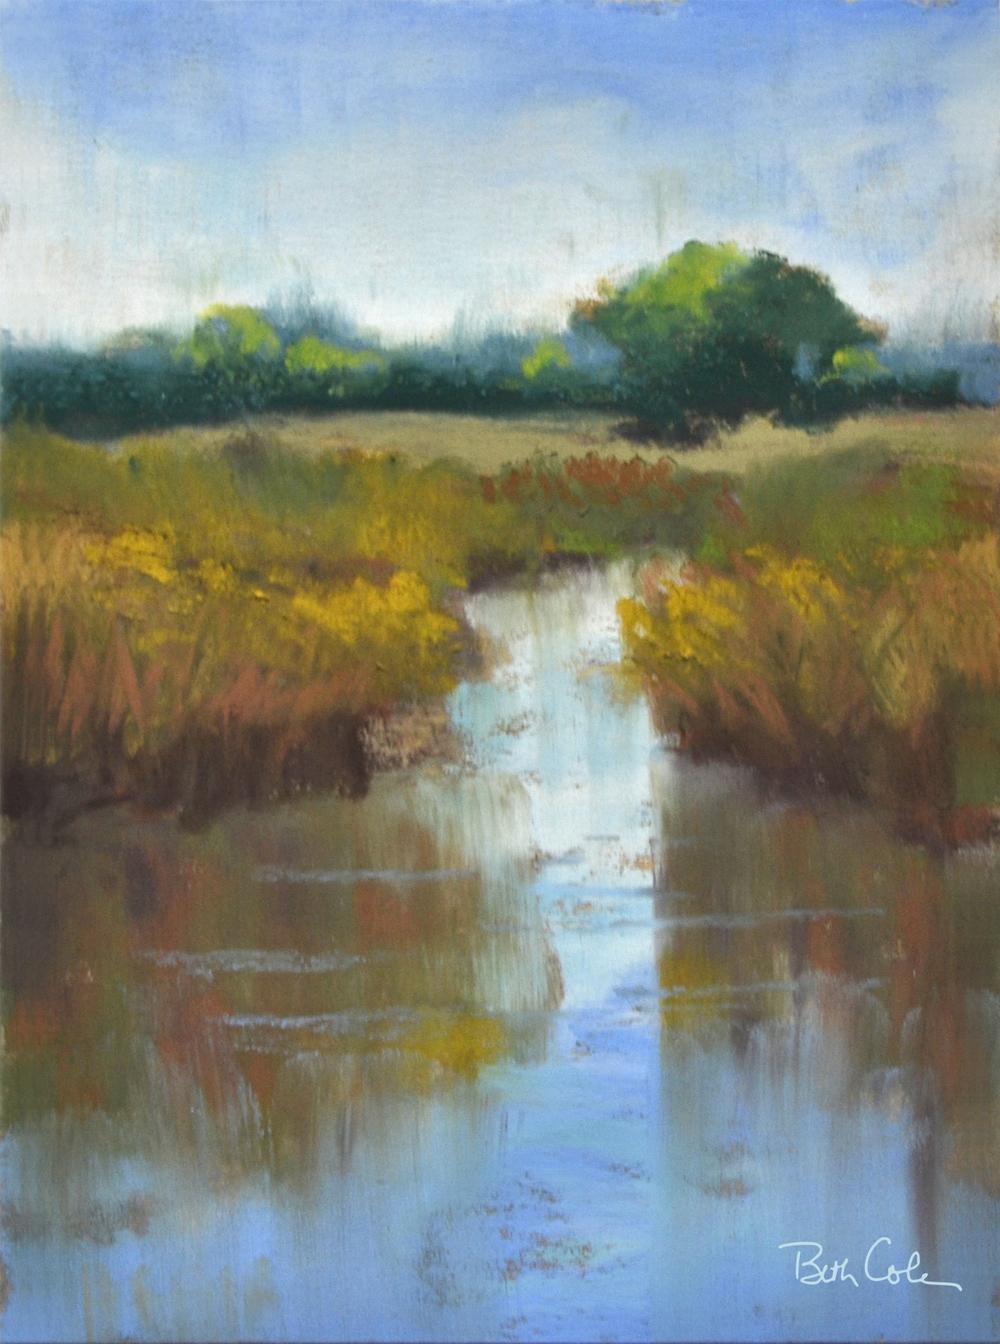 Still Waters Run Deep © Beth Cole